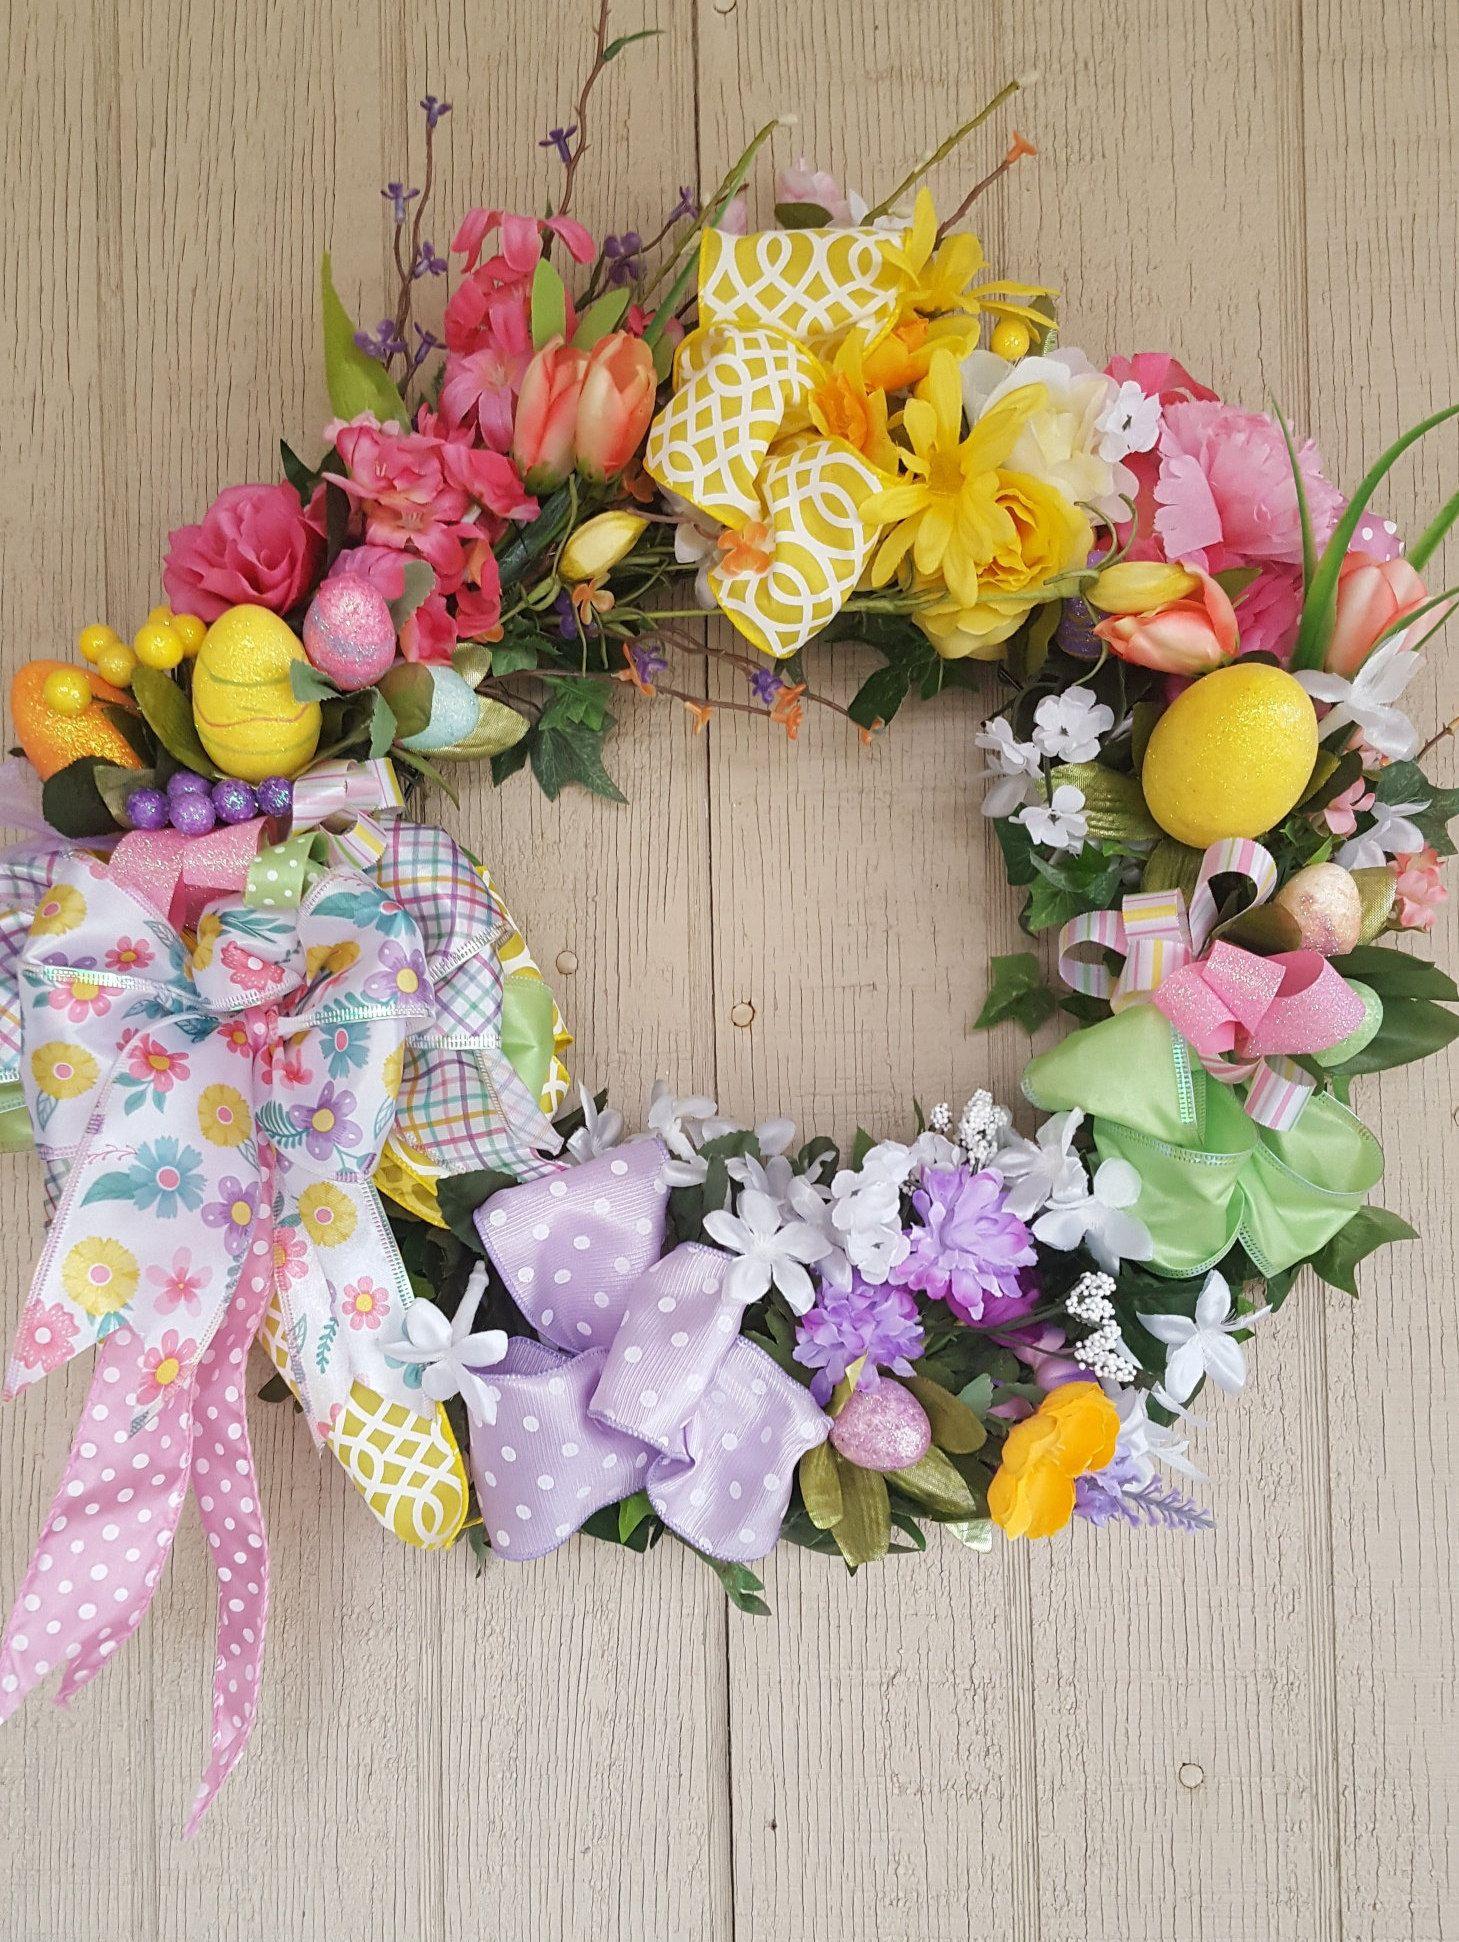 Springtime Easter Grapevine Wreath Diy spring wreath